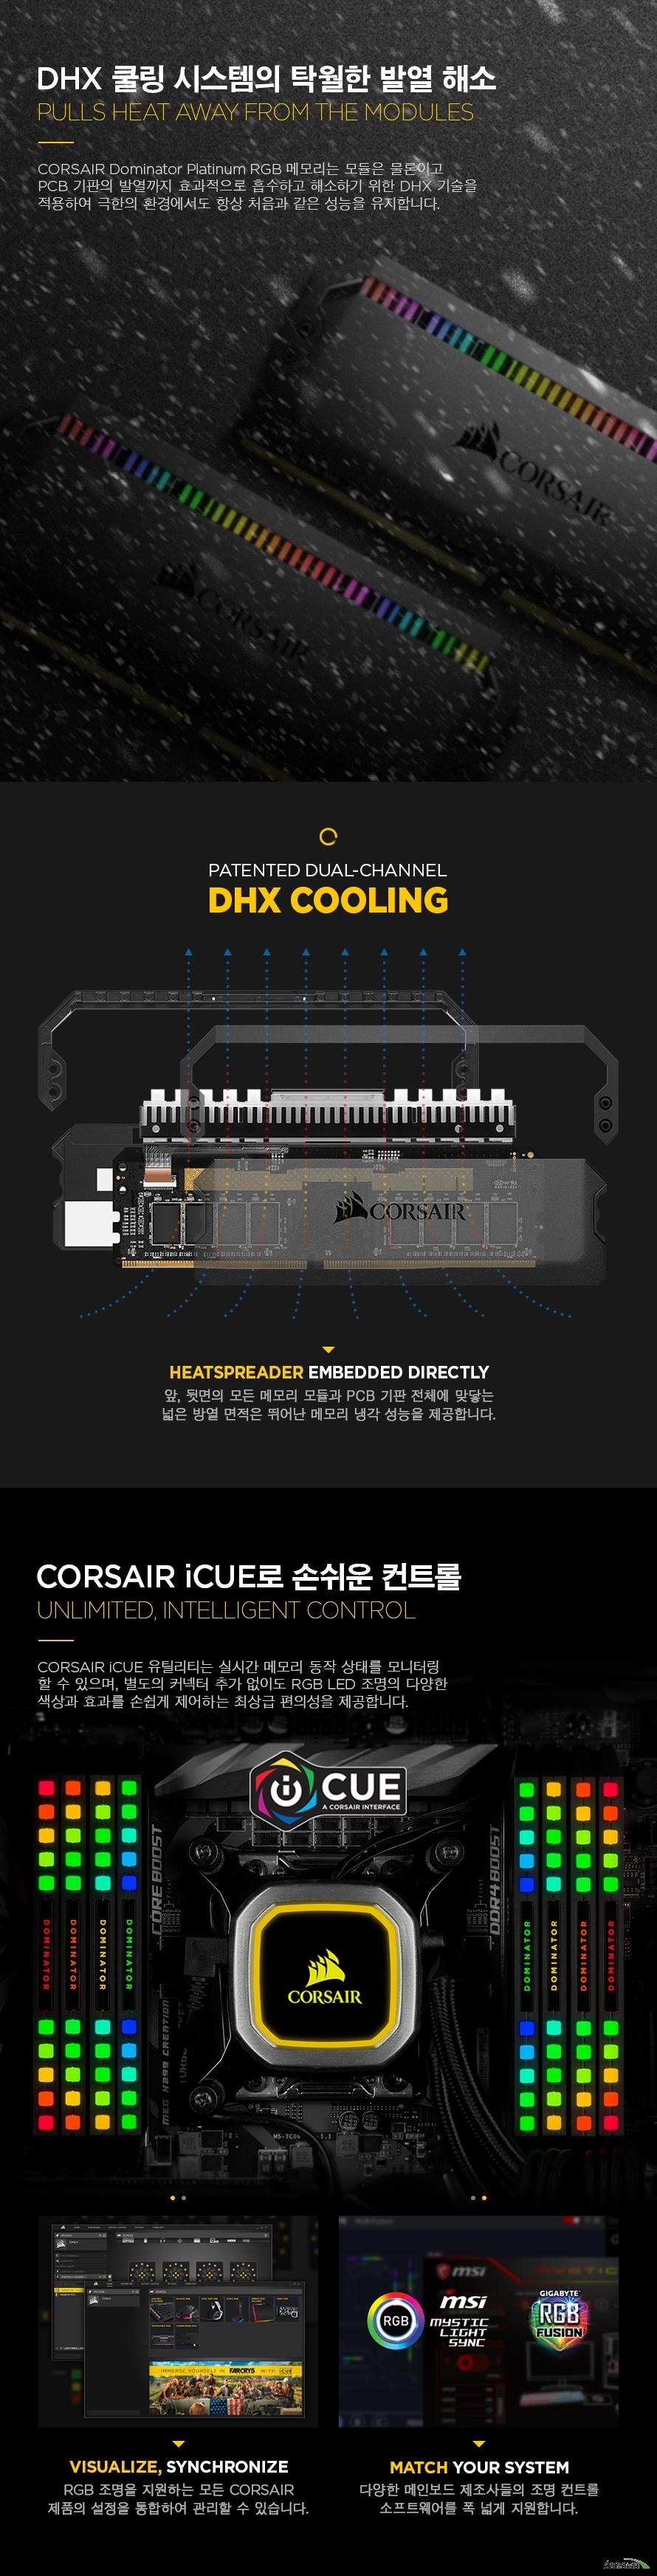 CORSAIR  DDR4 32G PC4-28800 CL18 Dominator Platinum RGB (8Gx4)